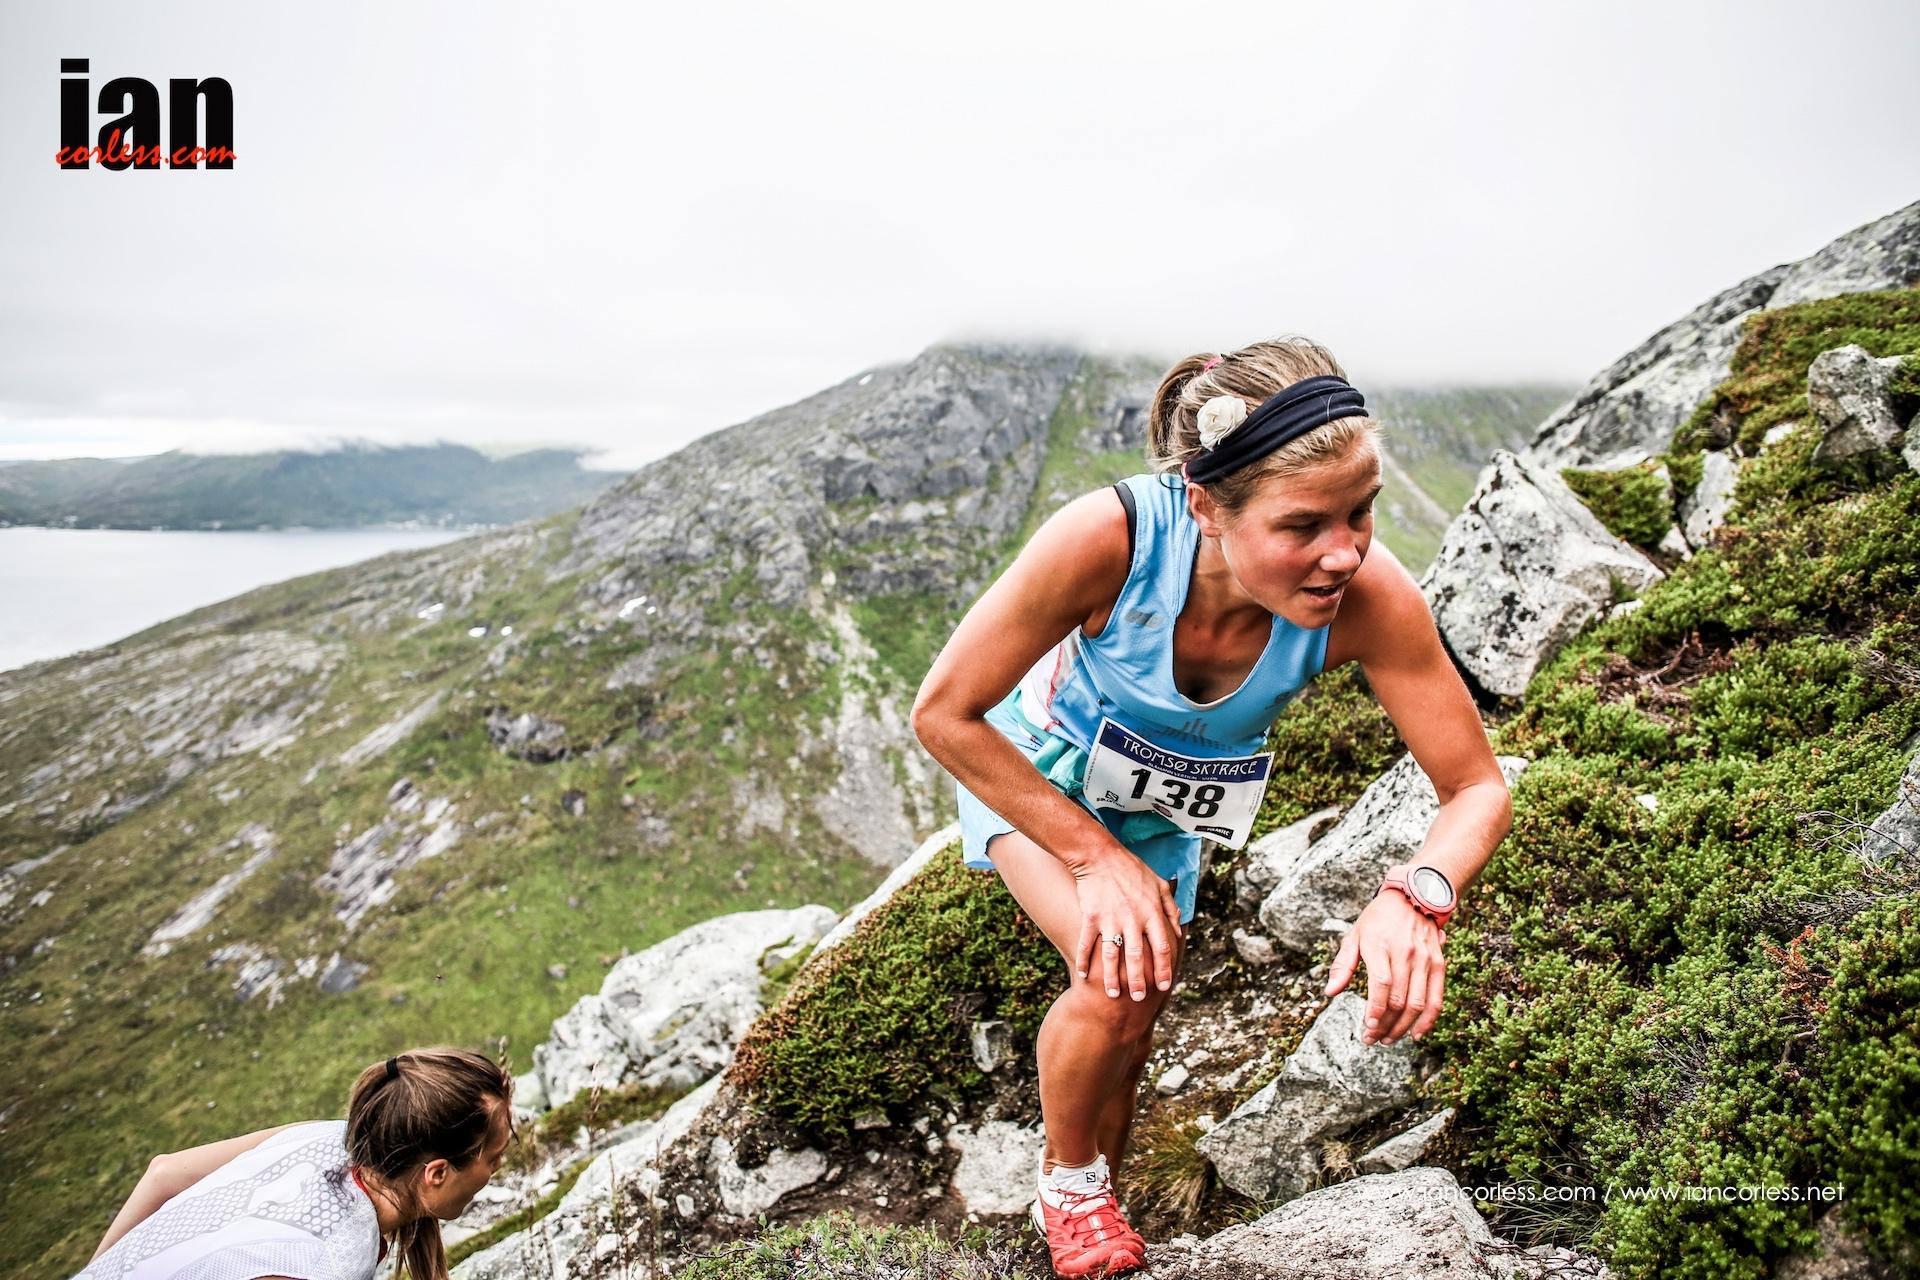 Tromsö VK 2015 – Race images and summary | iancorless.com